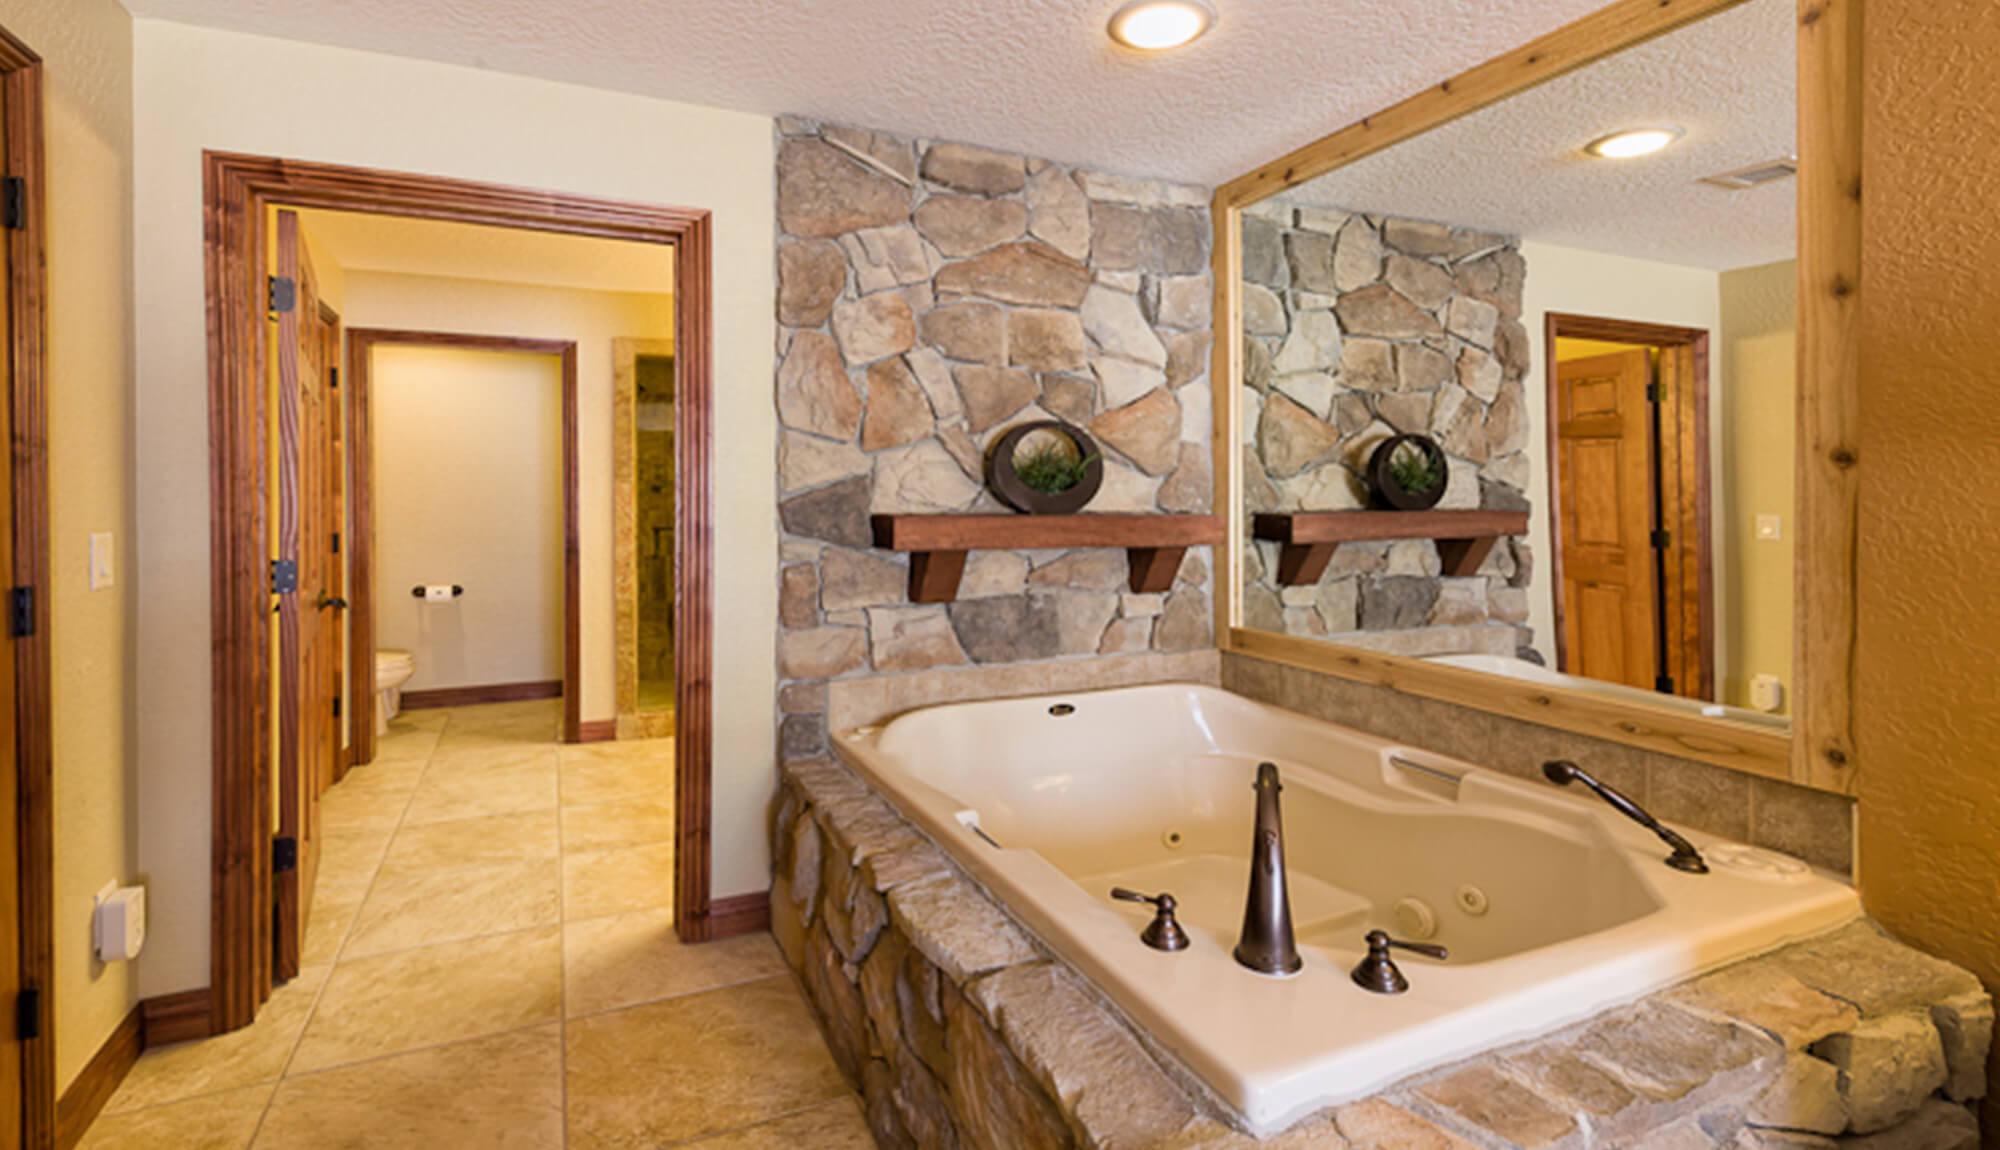 Jetted Tub in Luxury One-Bedroom Villa | Westgate Park City Resort & Spa | Westgate Resorts